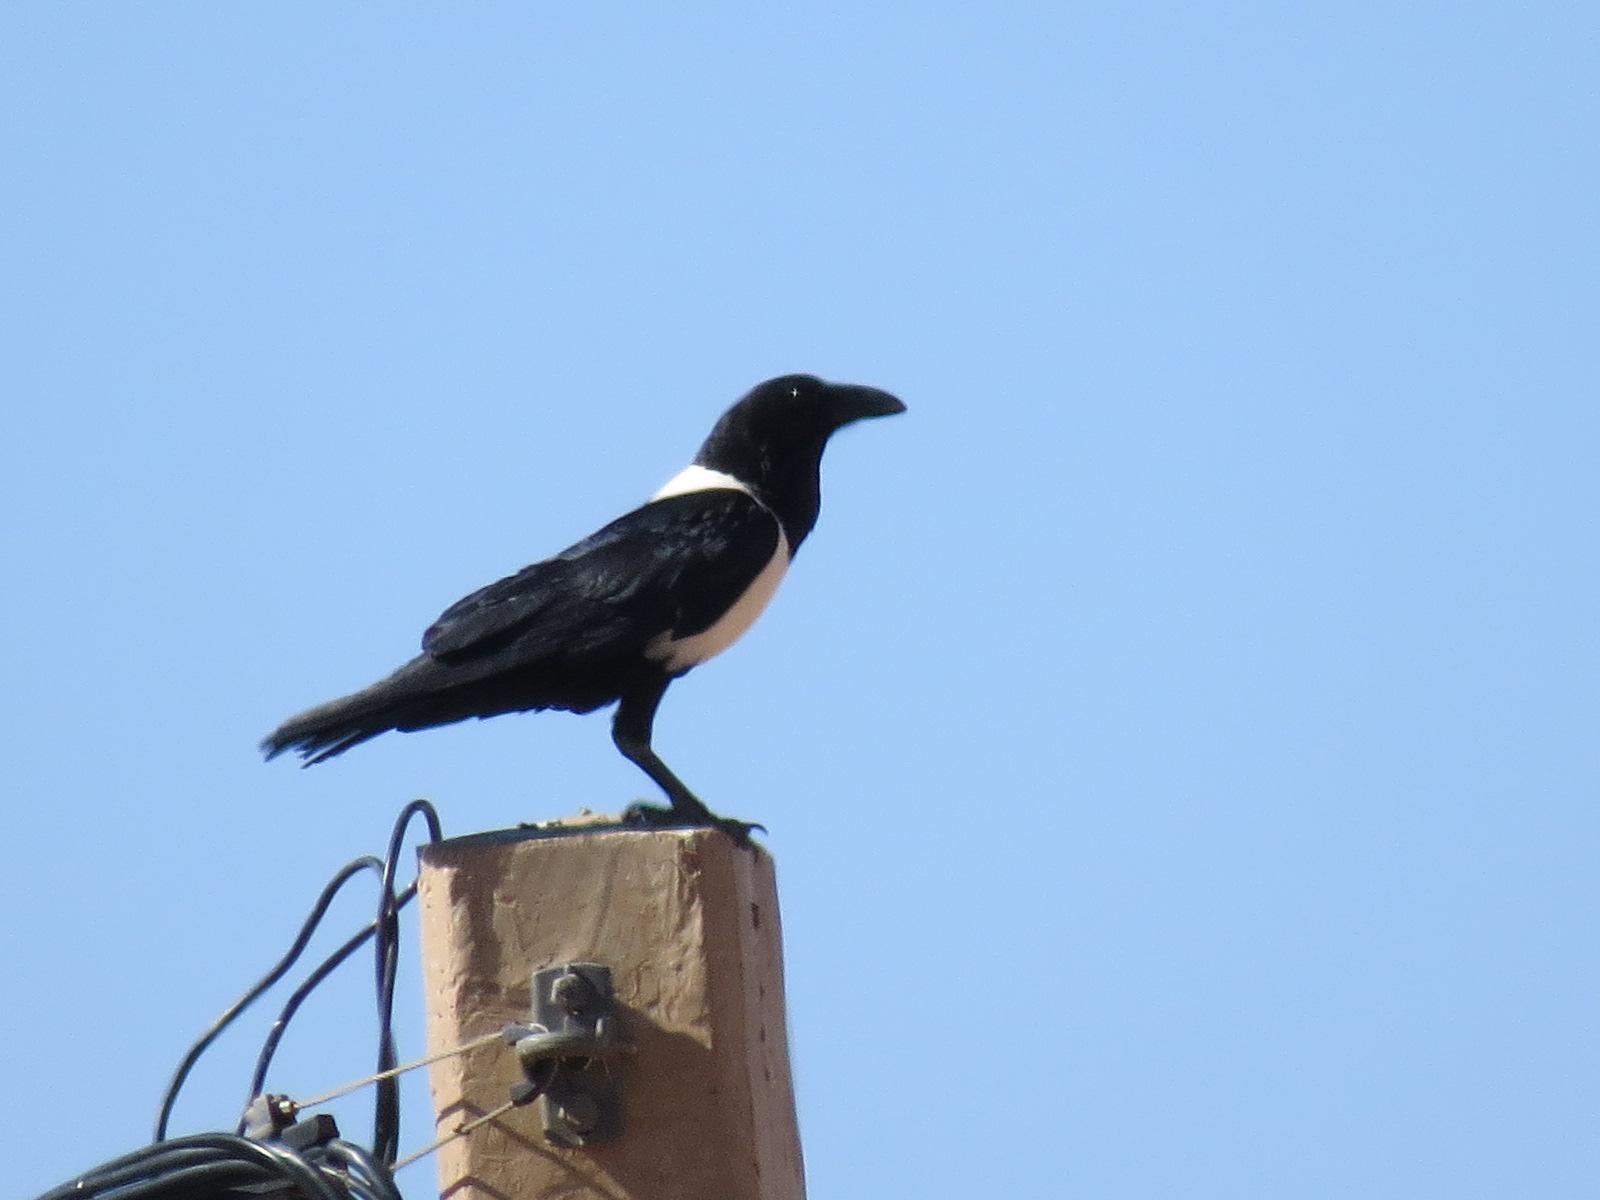 Pied Crow (Corvus albus), Mhamid, eastern Sahara, Morocco, 23 Feb. 2017 (Robert Swann)